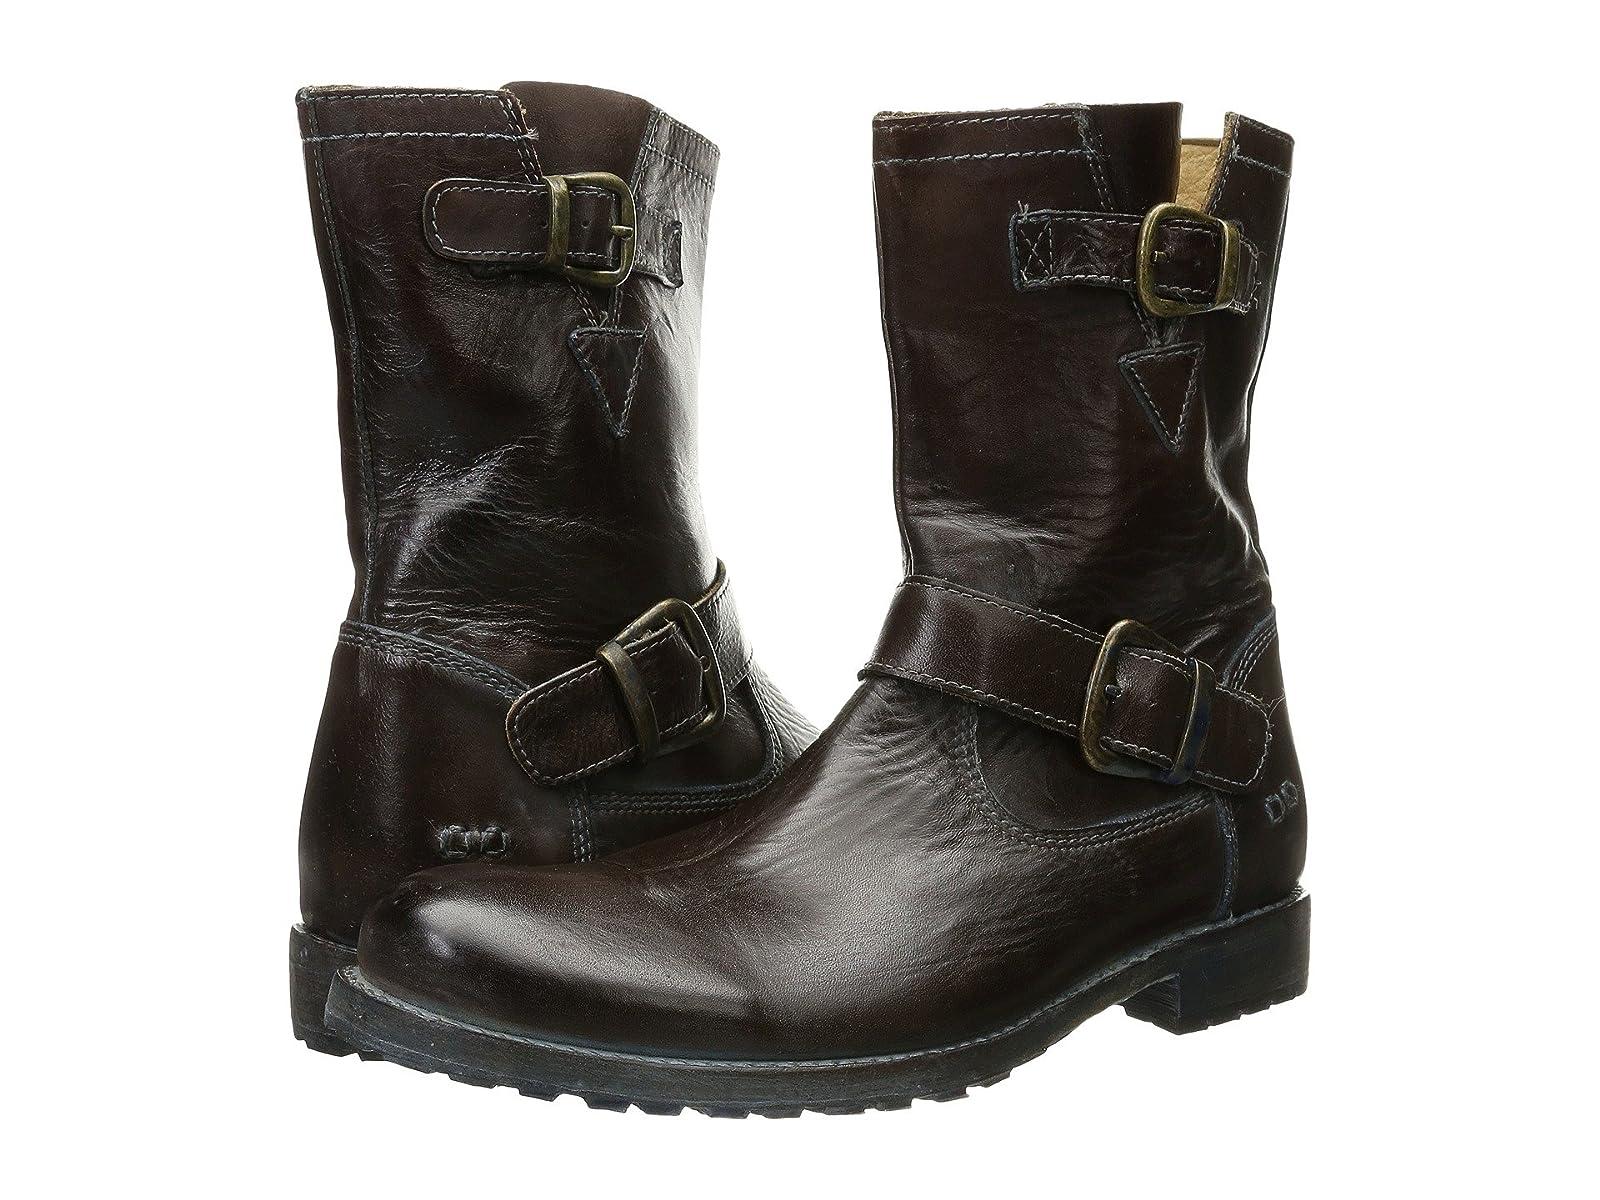 Bed Stu AshtonCheap and distinctive eye-catching shoes